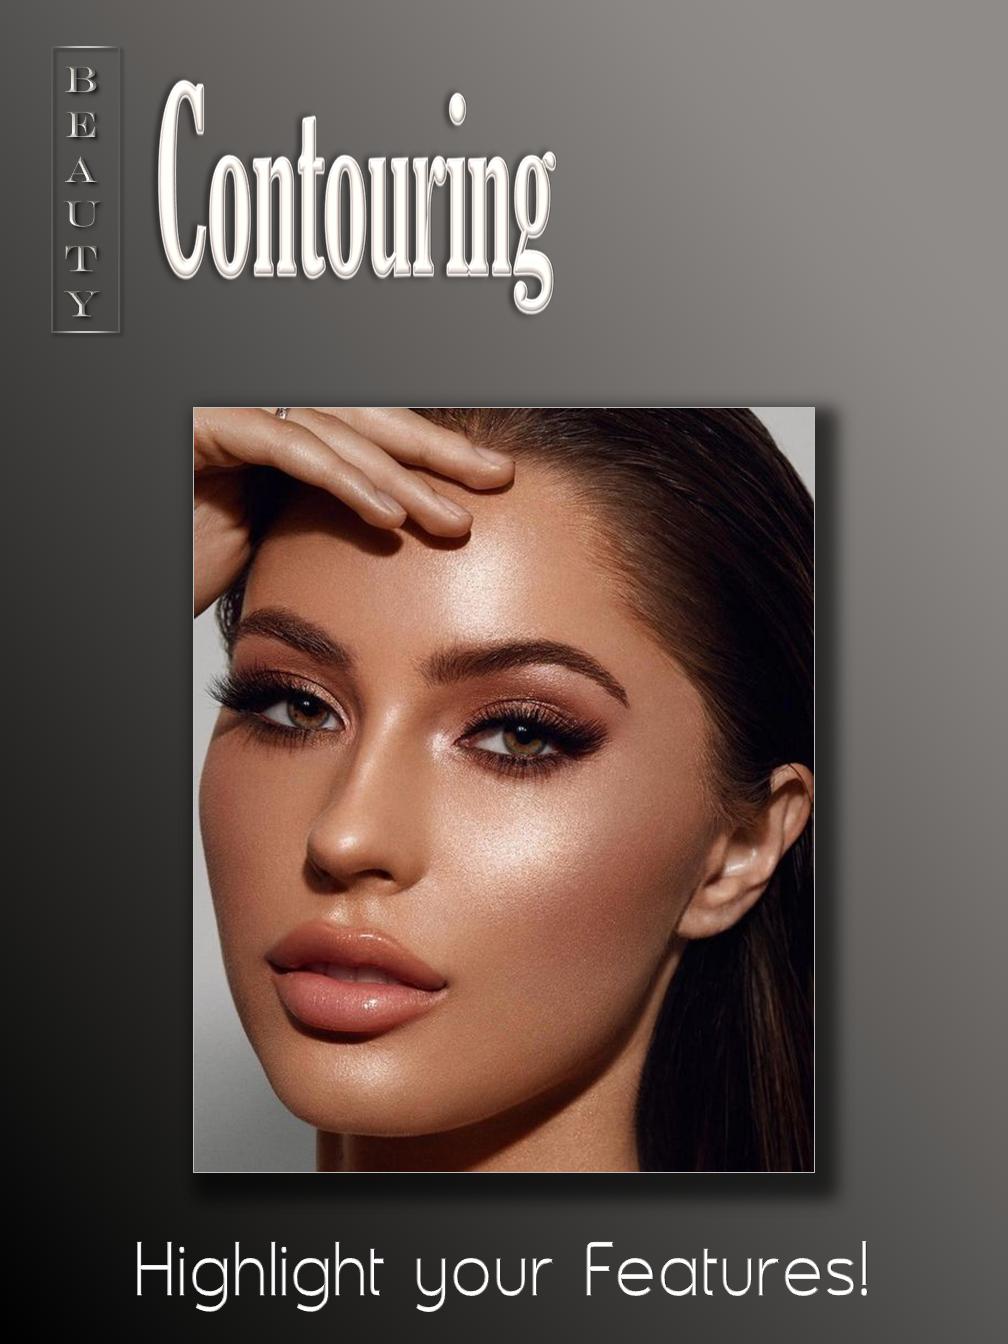 Contouring